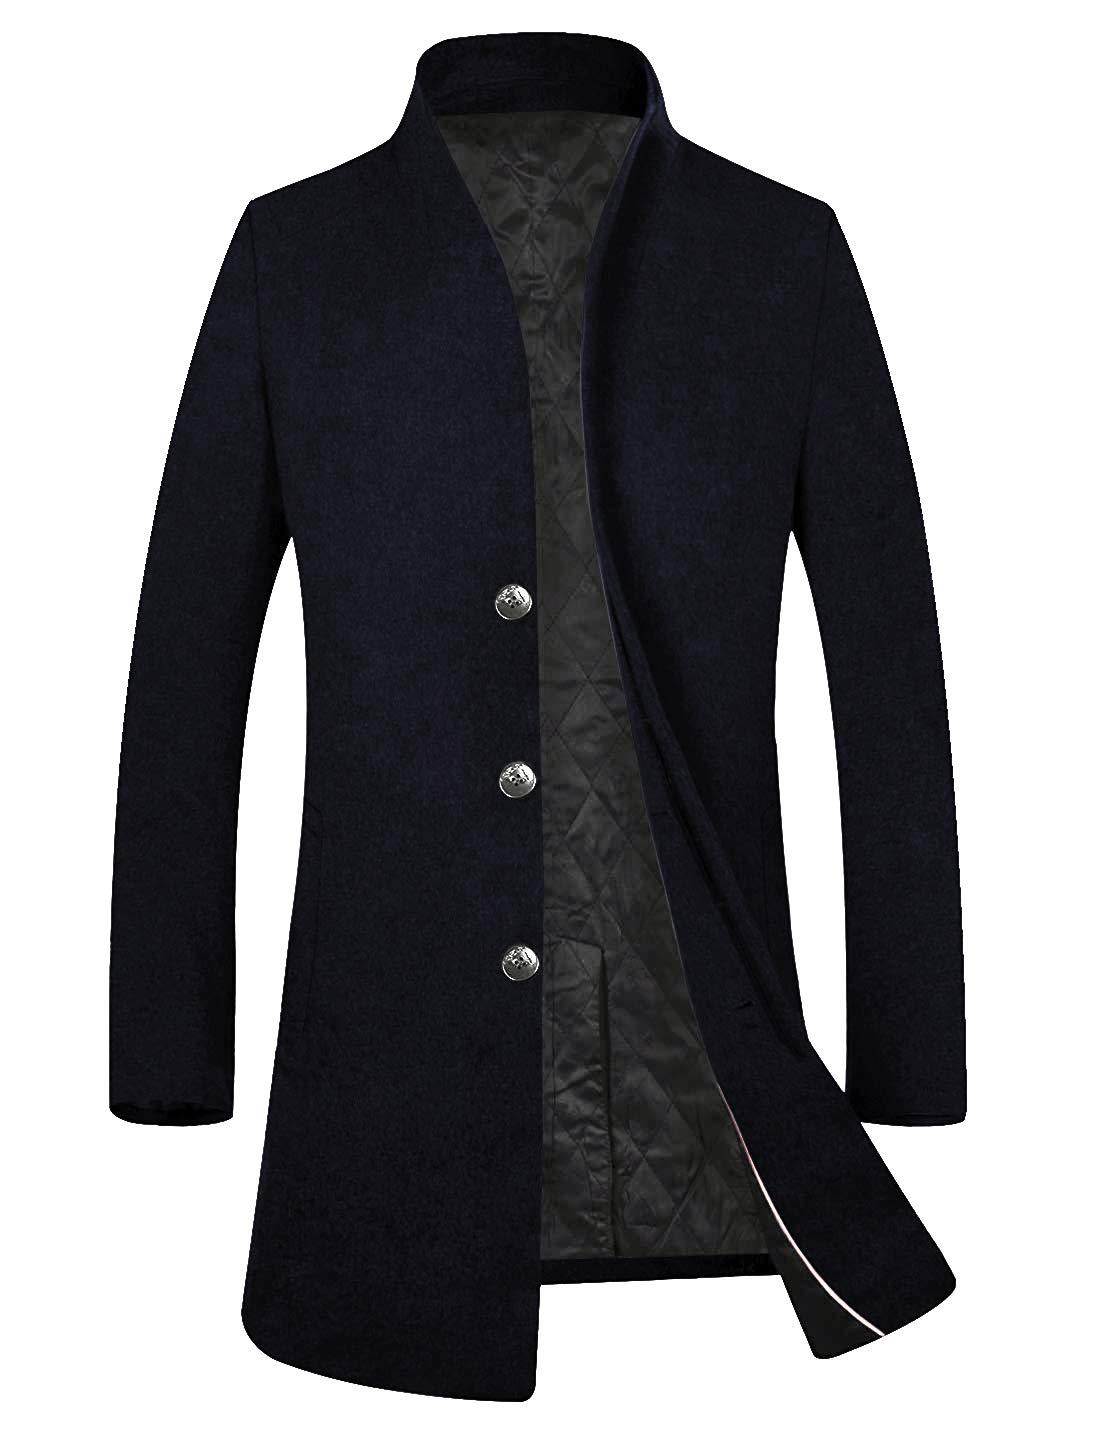 APTRO Men's Fleece Lining Slim Fit Wool Trench Coat 1681 Navy S by APTRO